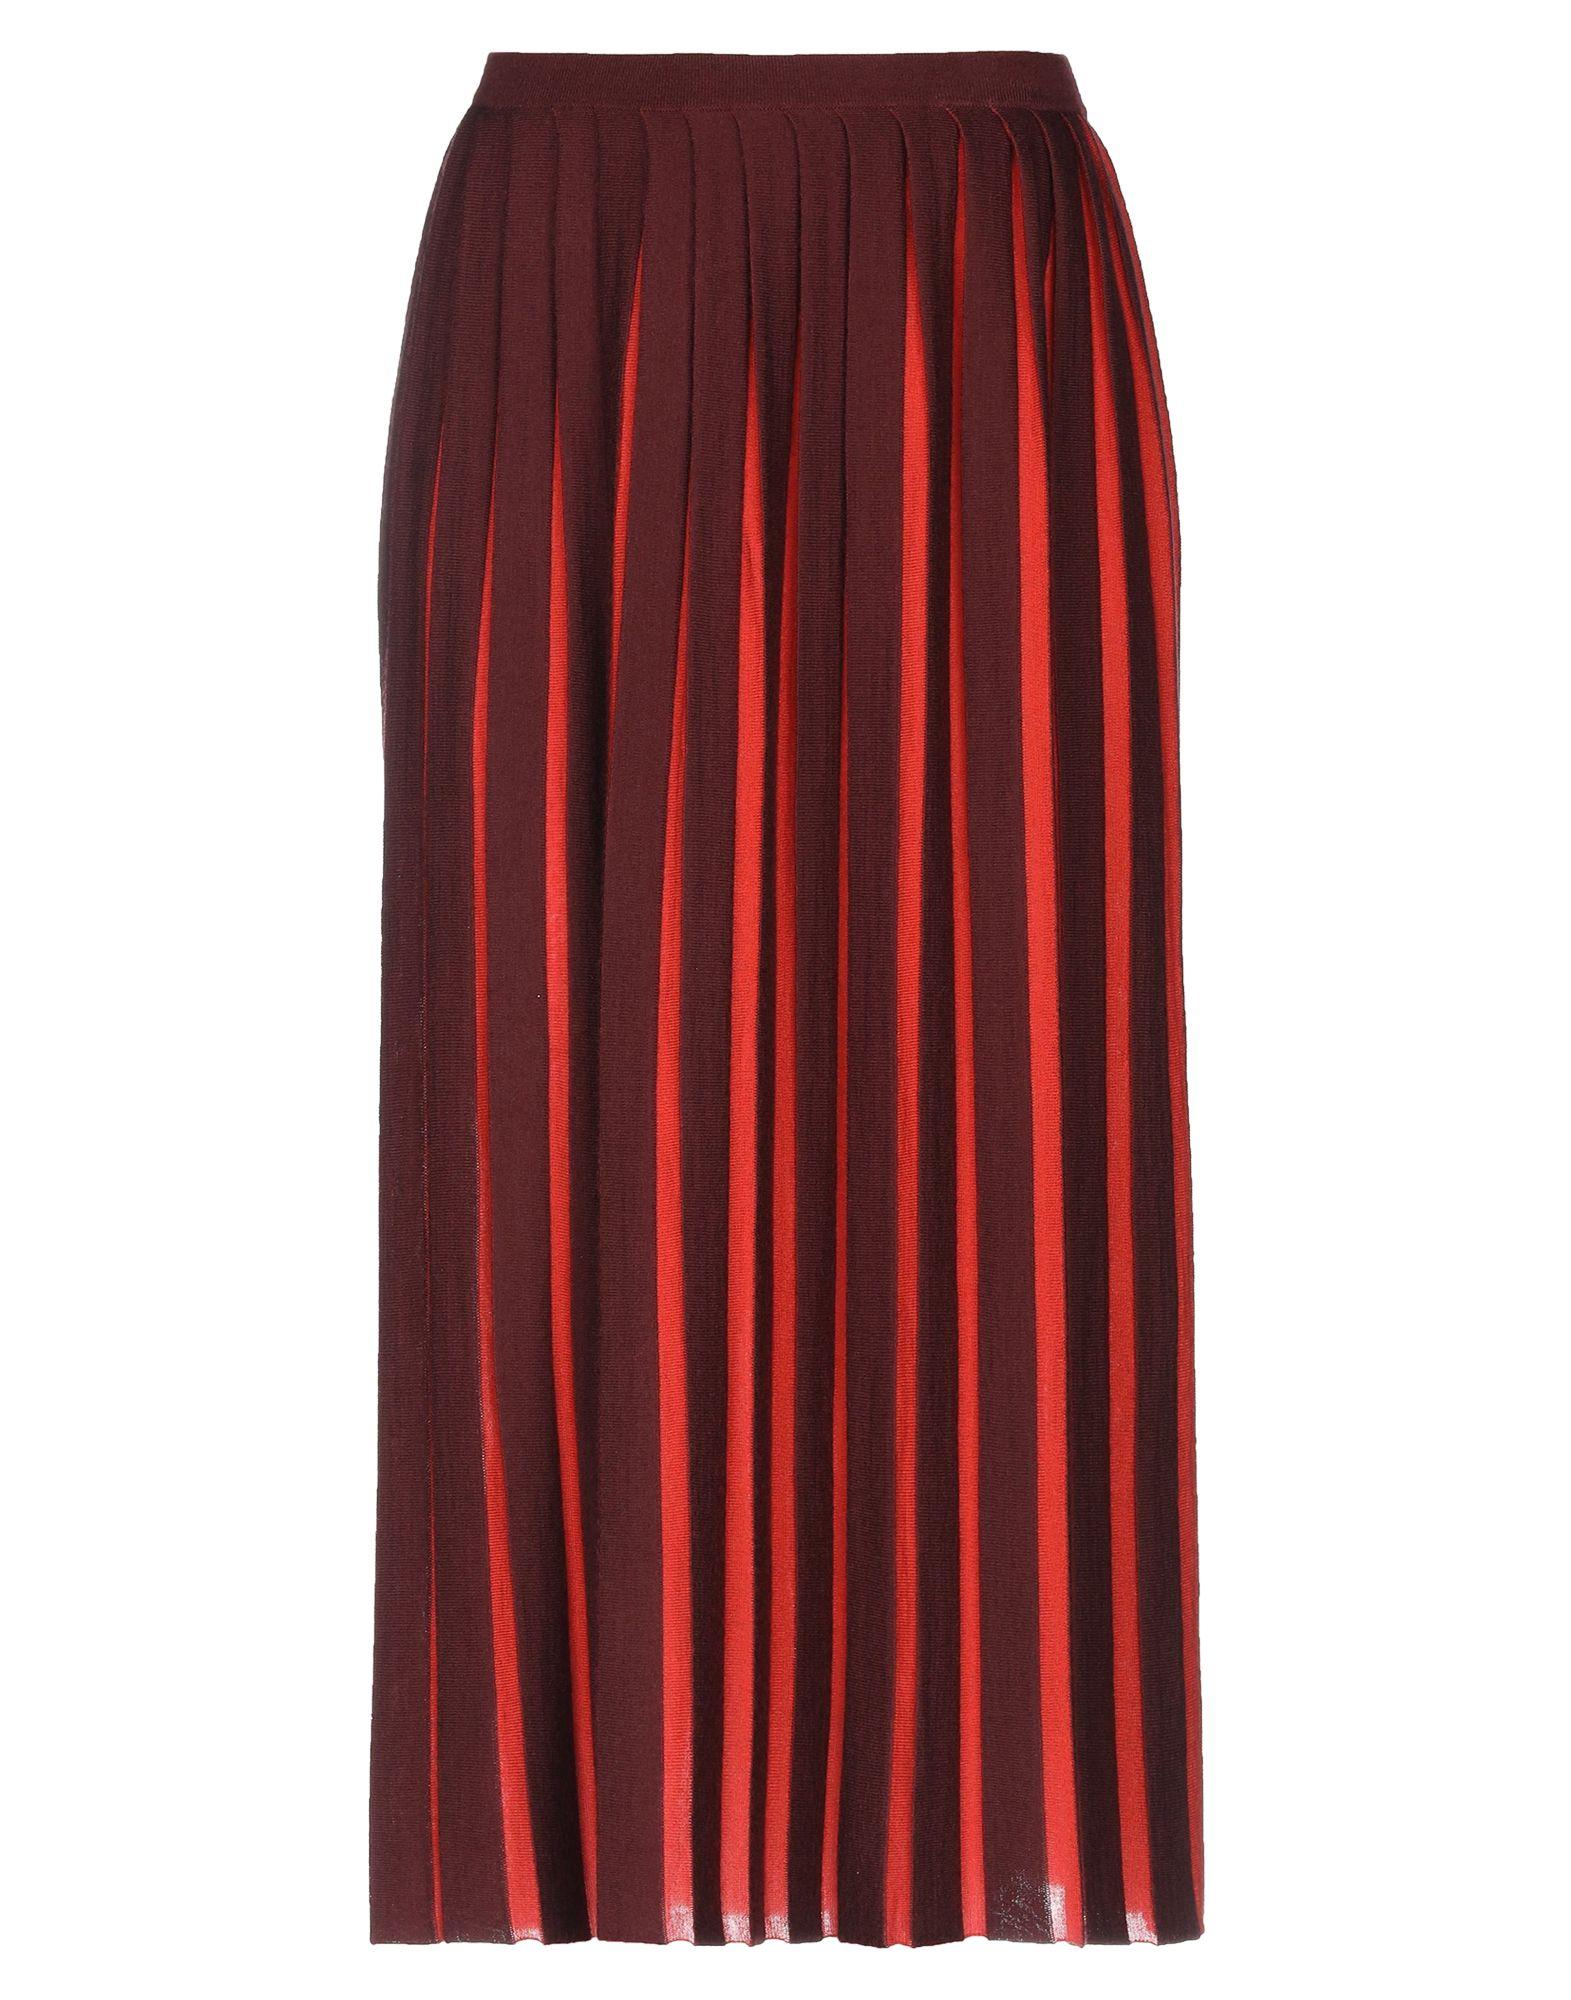 MALÌPARMI M.U.S.T. Юбка длиной 3/4 malìparmi юбка длиной 3 4